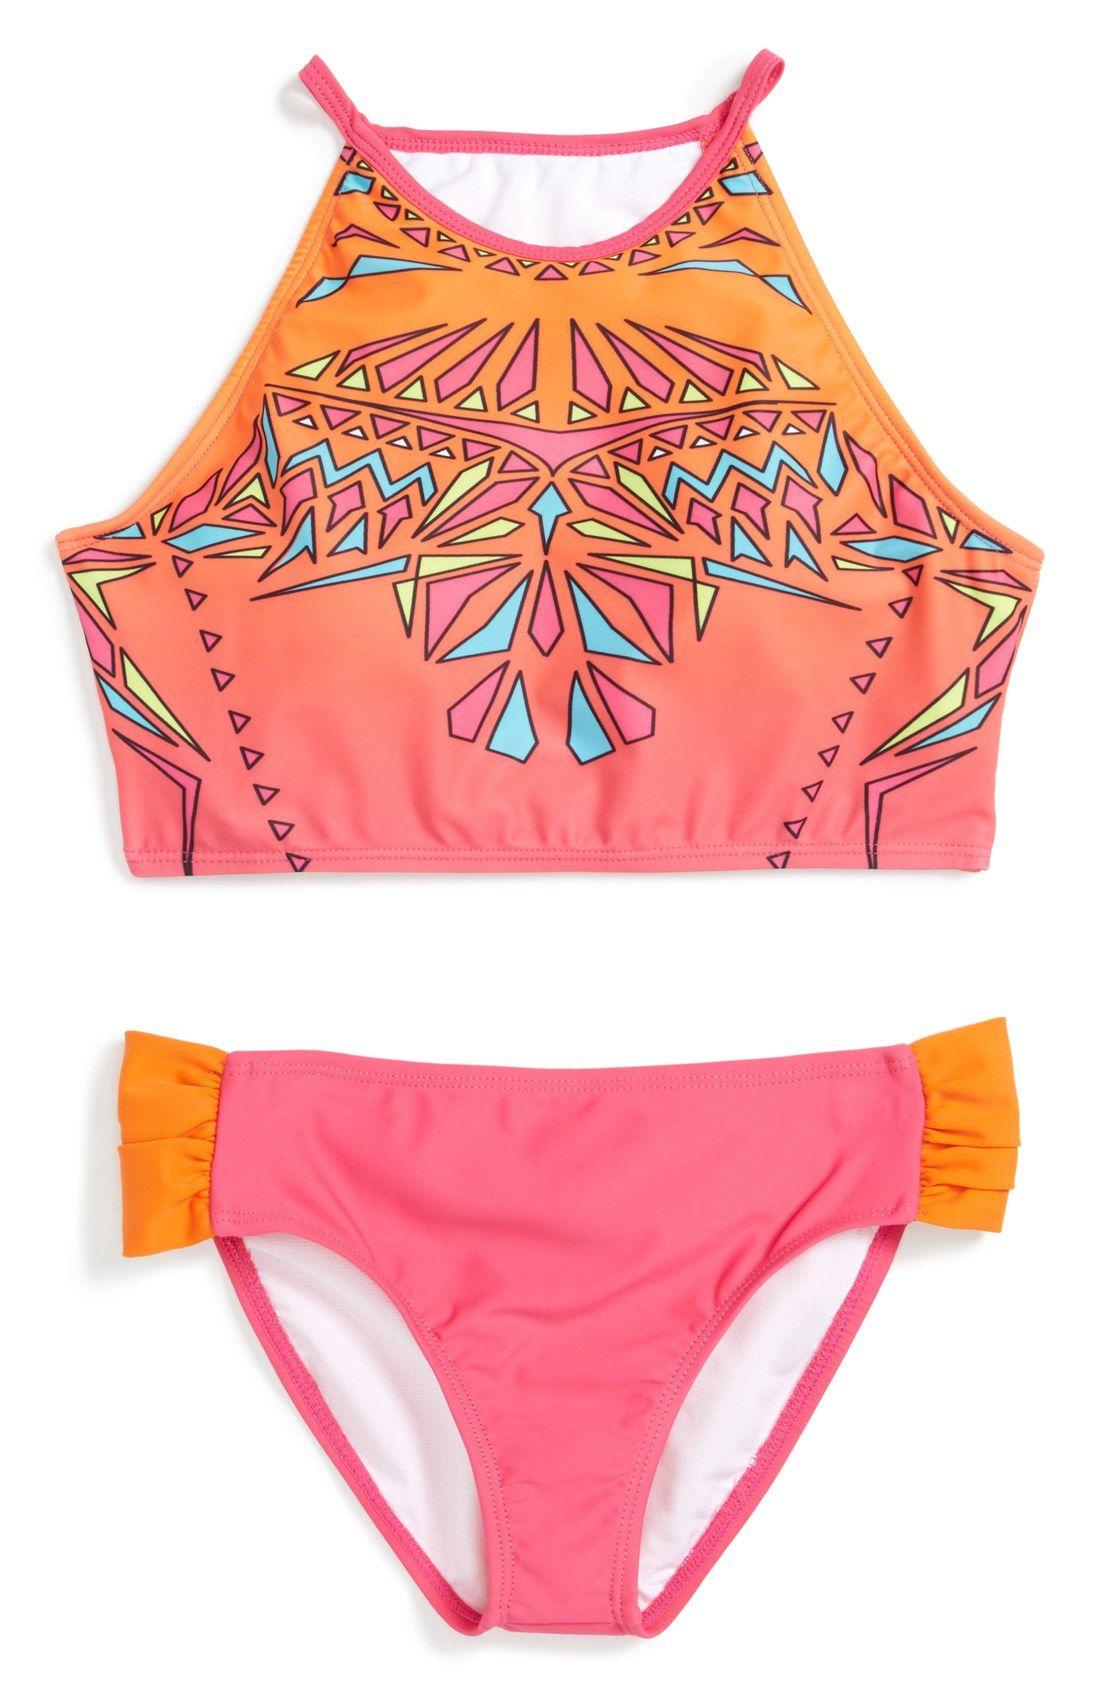 Angel Beach Big Girls Laser-Cut Ombre Bikini Swimsuit